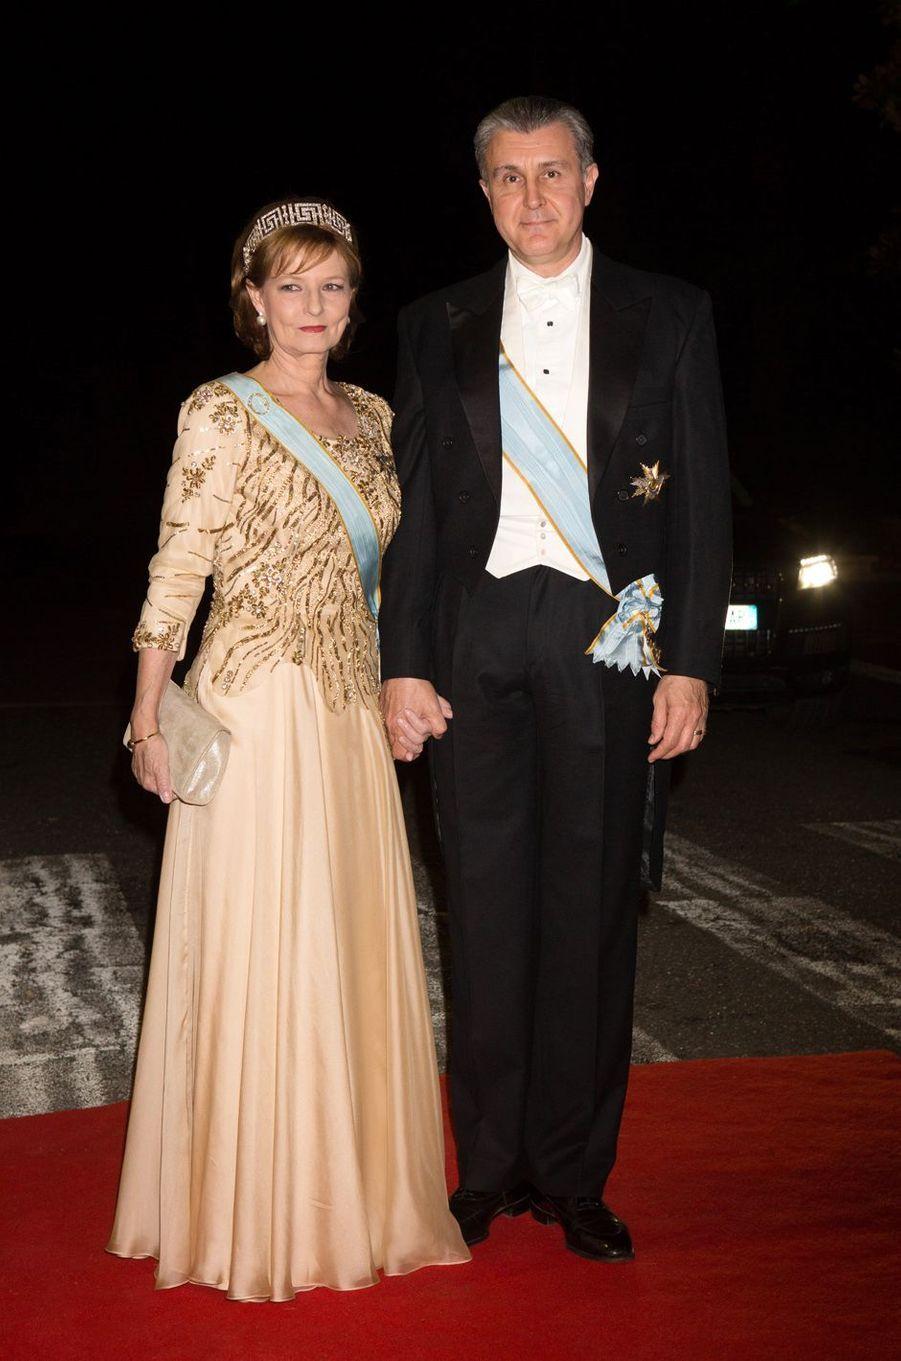 Le prince Radu de Roumanie et la princesse Margareta de Roumanie